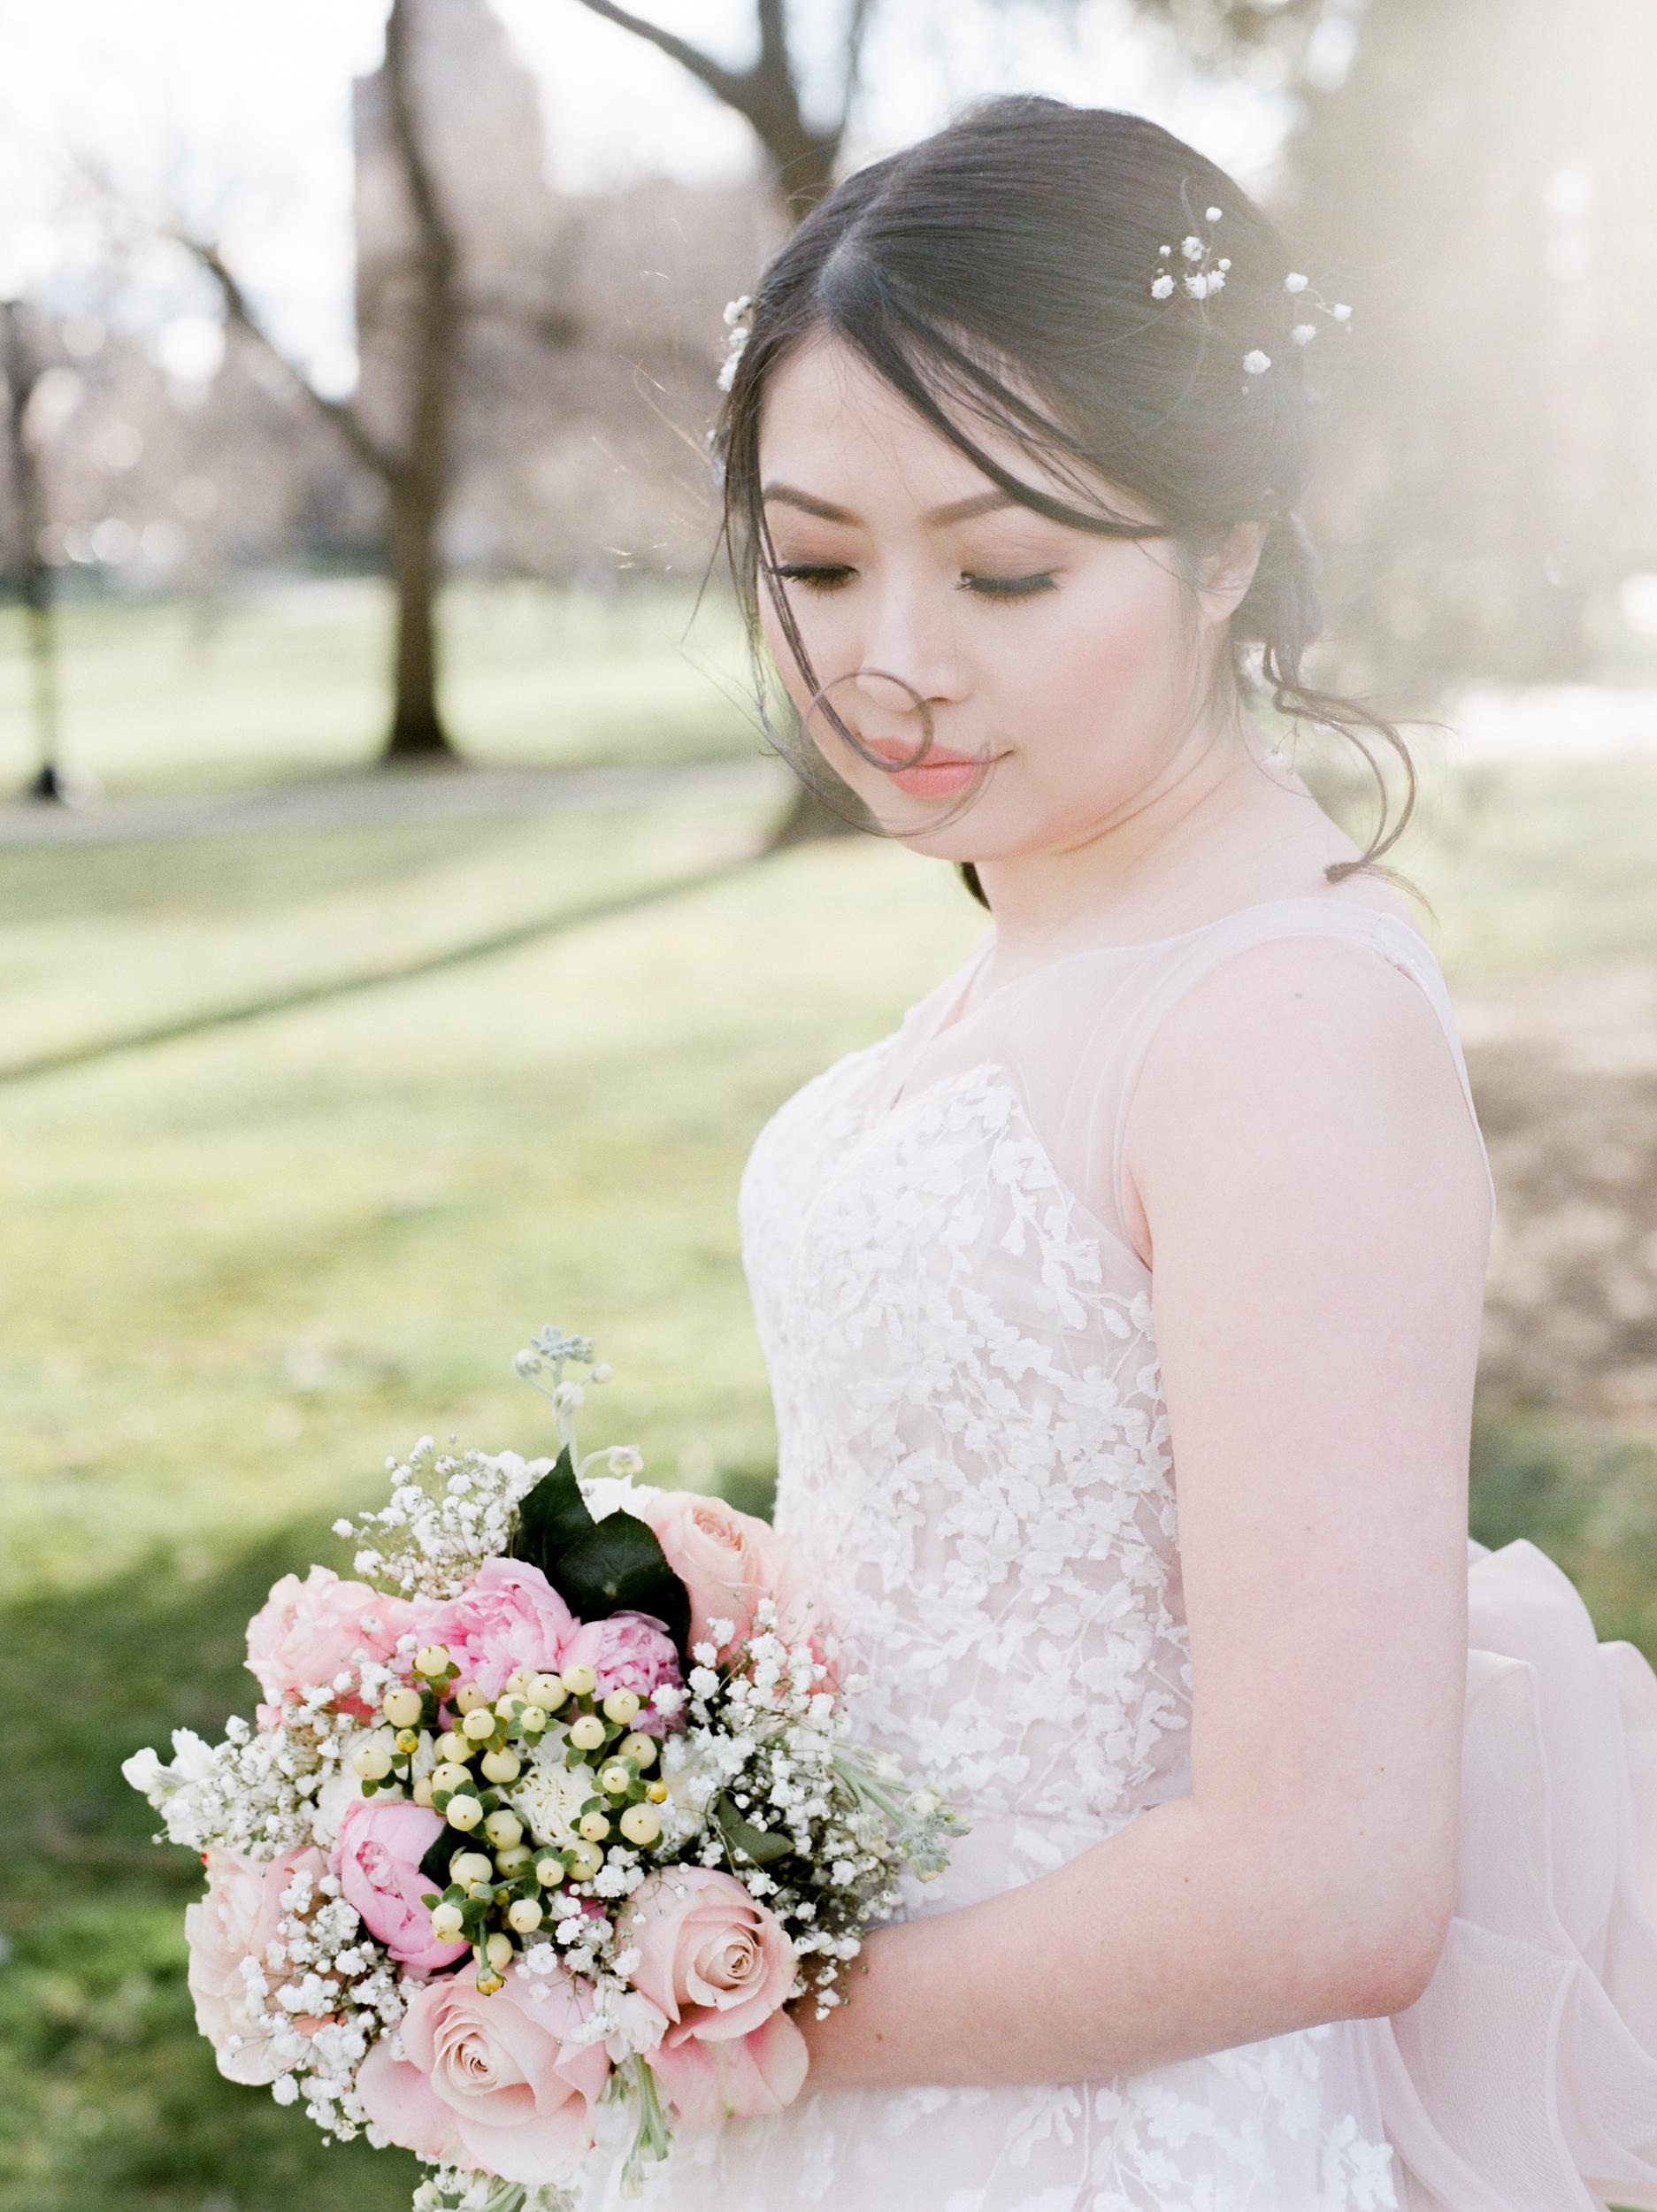 Bridal Portrait Photography In Boston